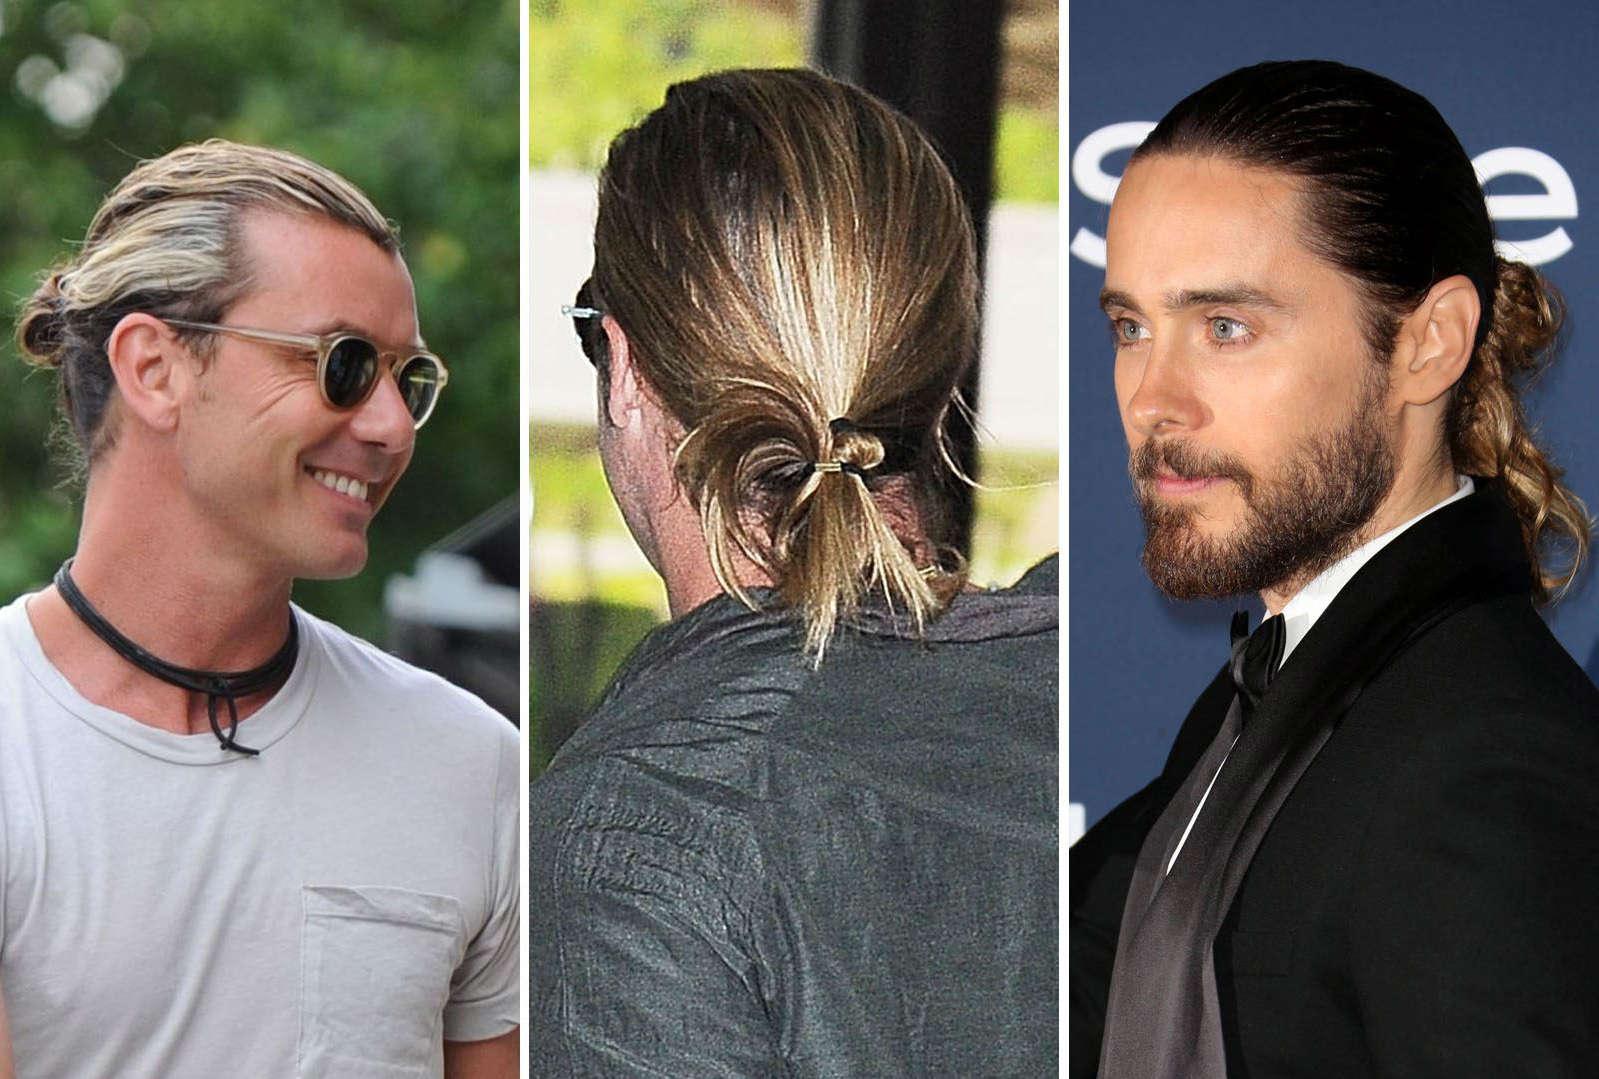 Männer mit Dutt - Feminine Frisuren erobern Hollywood